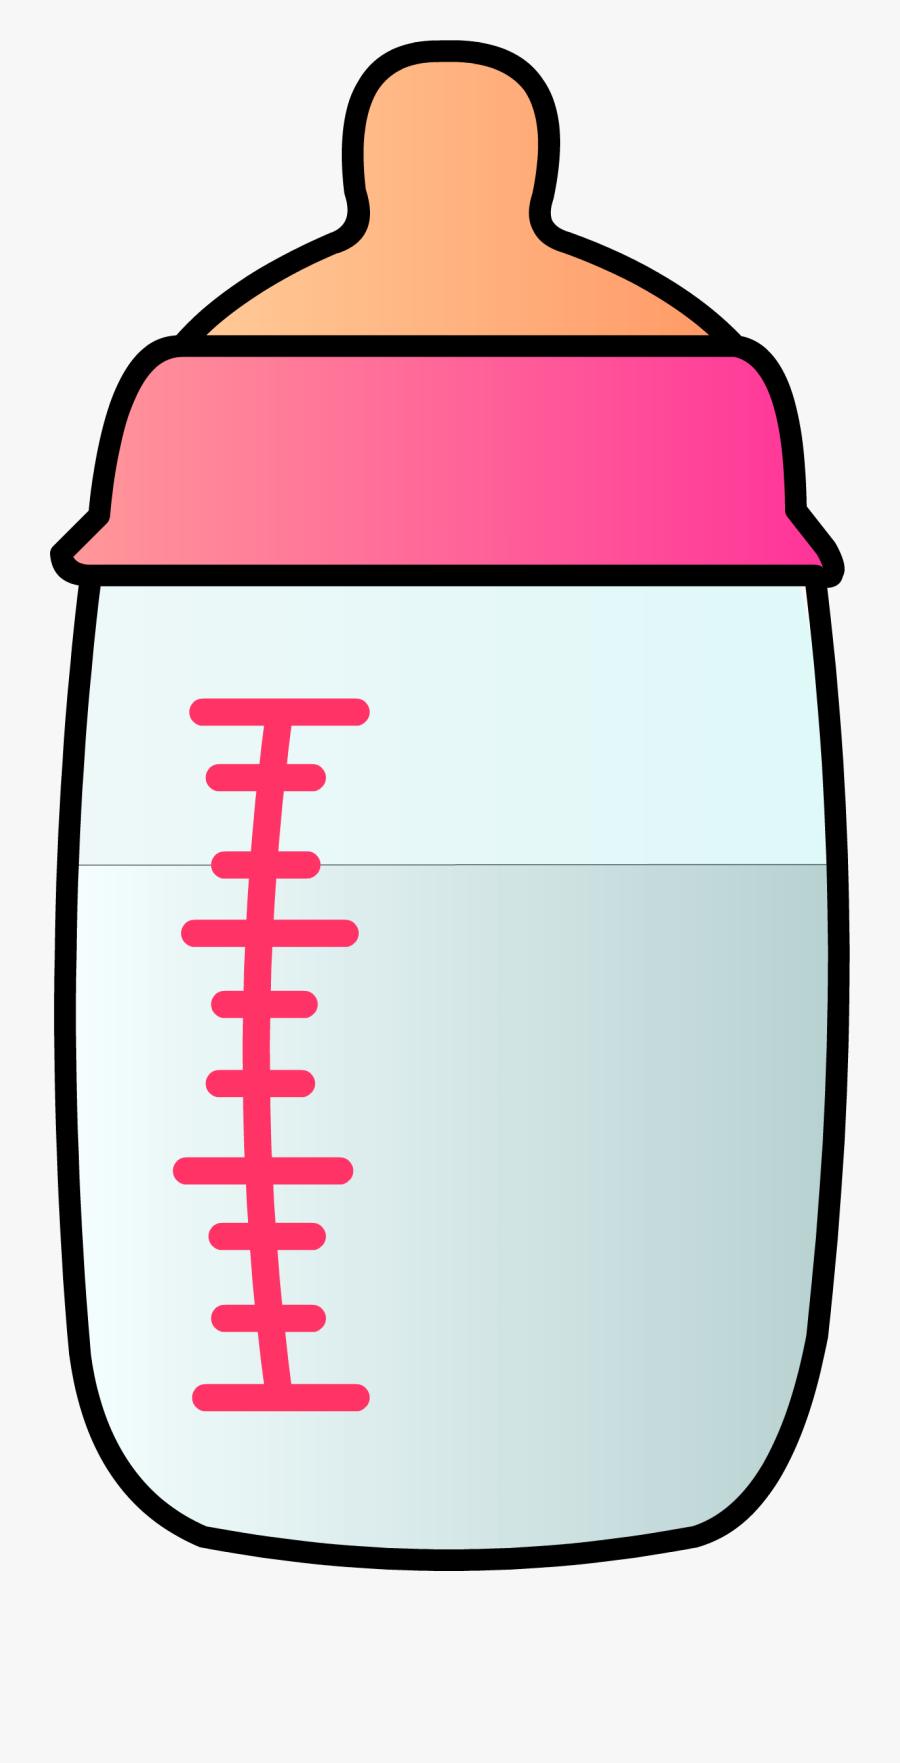 Battle Insanity Bodies - Baby Milk Bottle Cartoon, Transparent Clipart